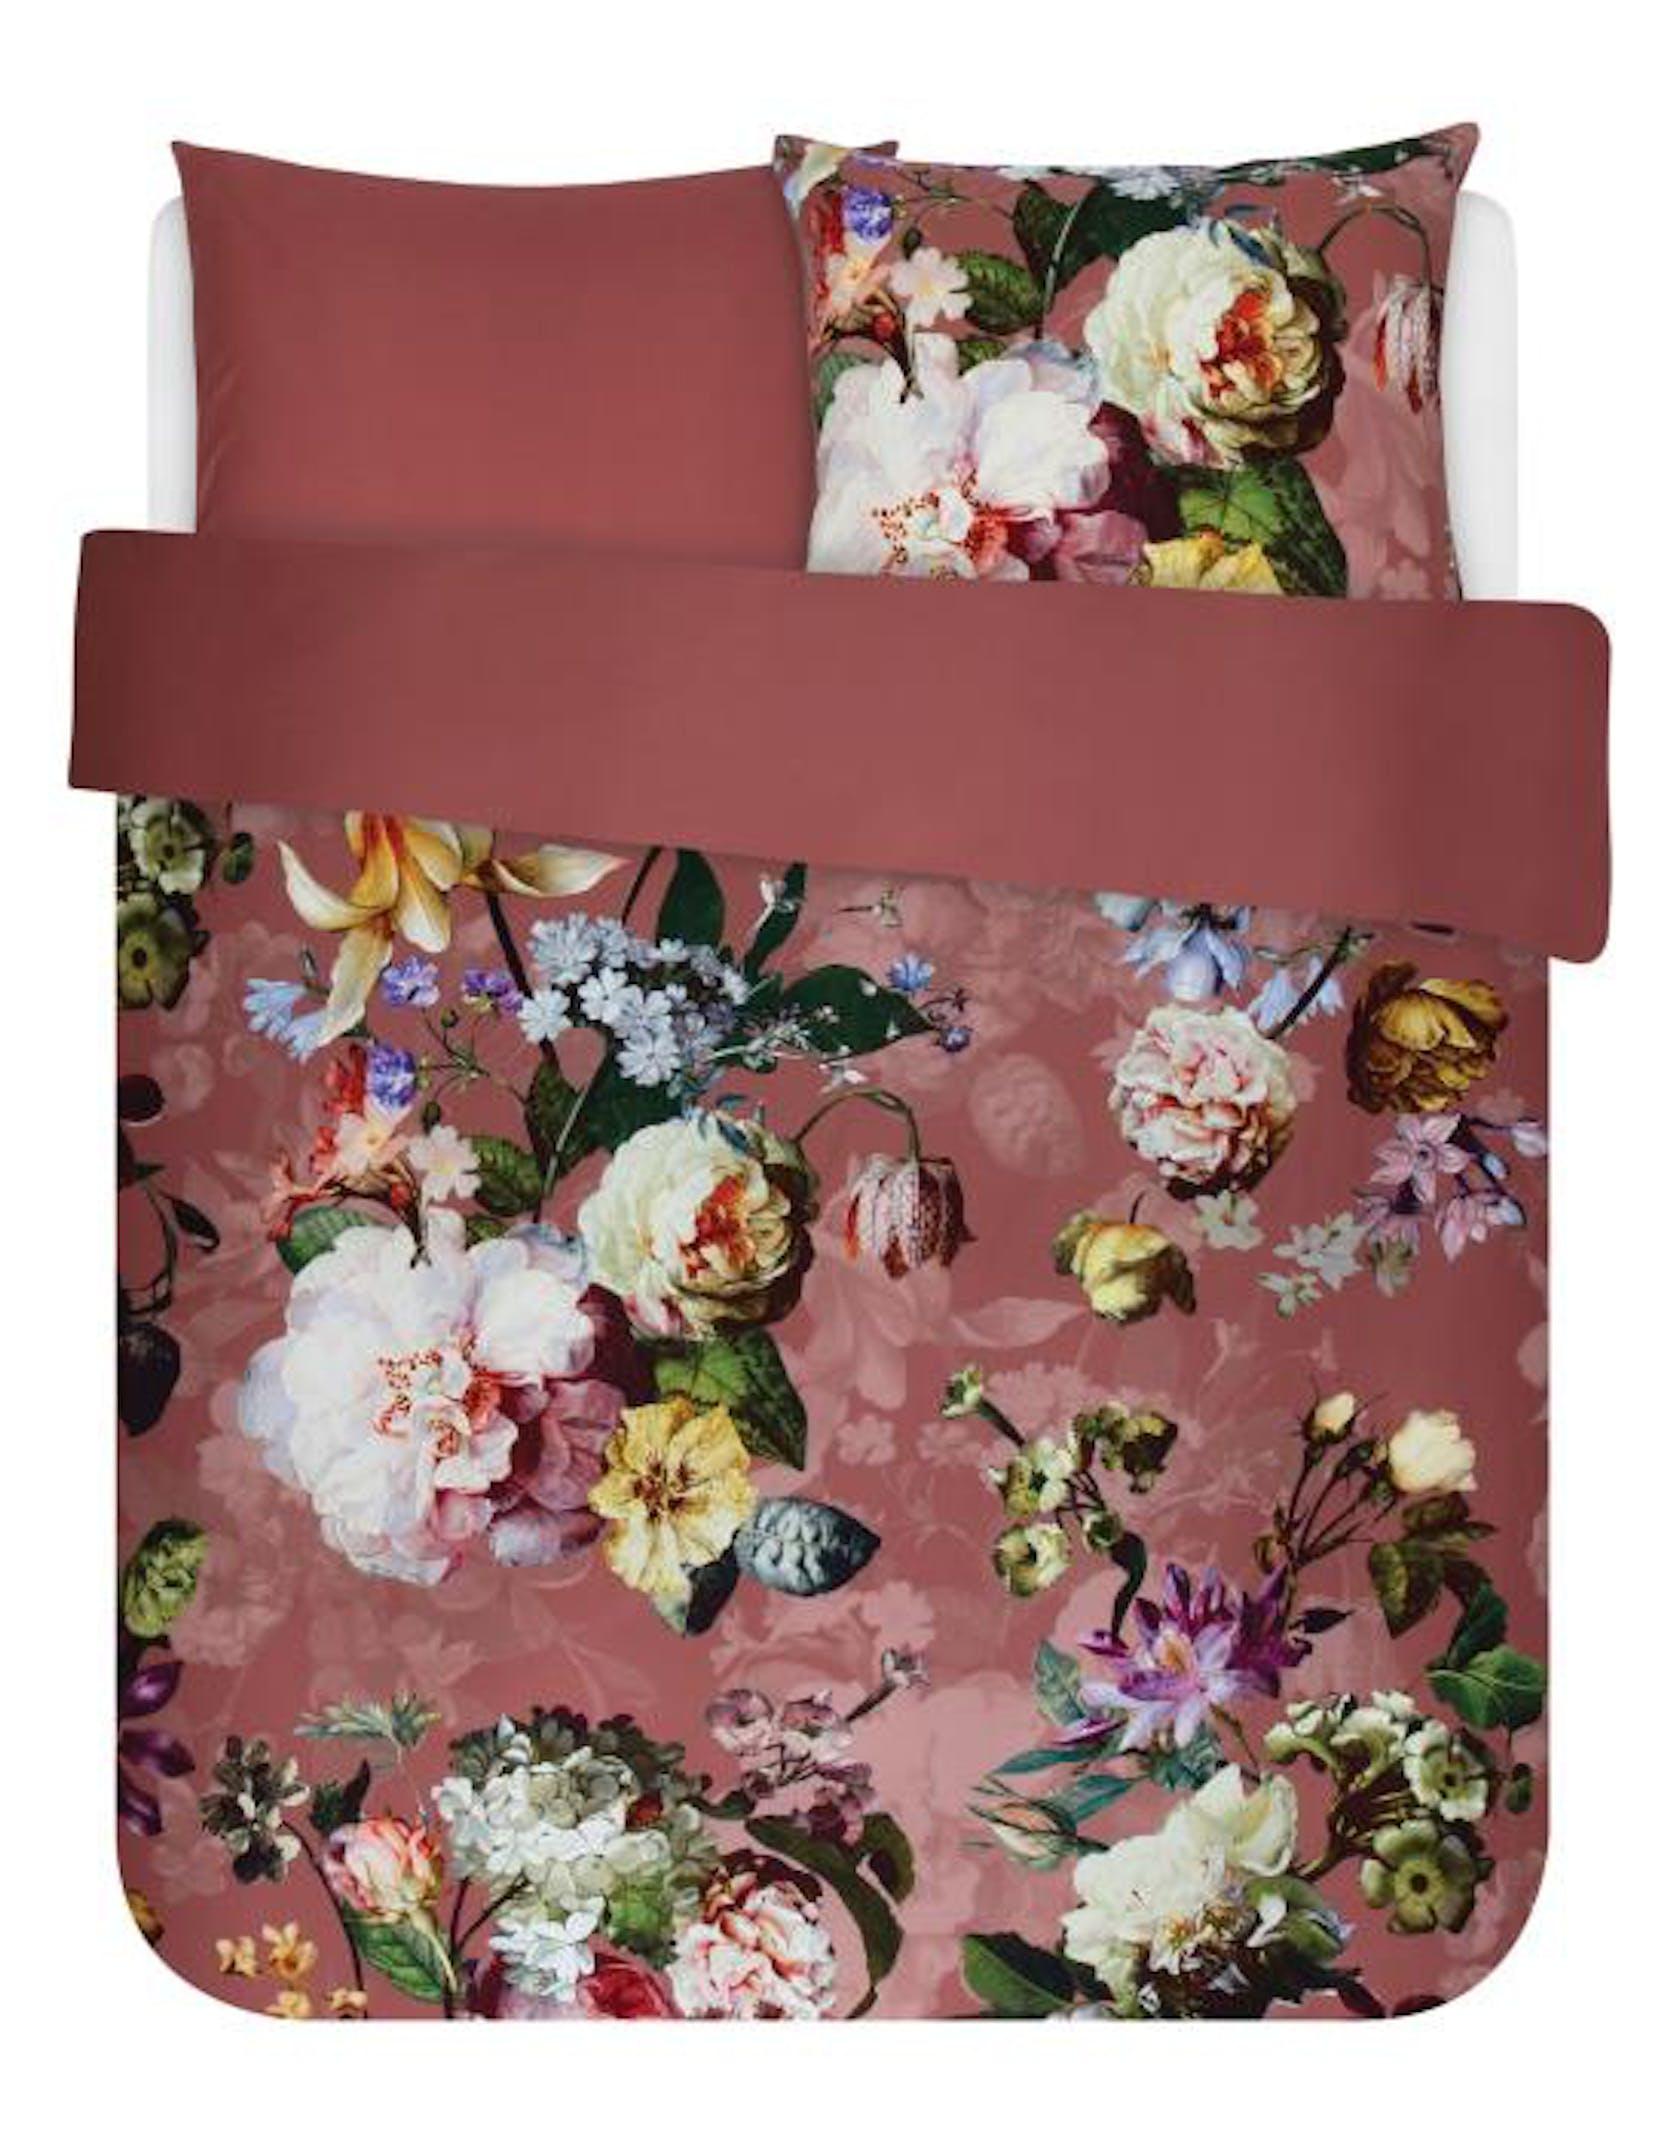 ESSENZA Fleur Dusty rose Dekbedovertrekset 200 x 220 cm